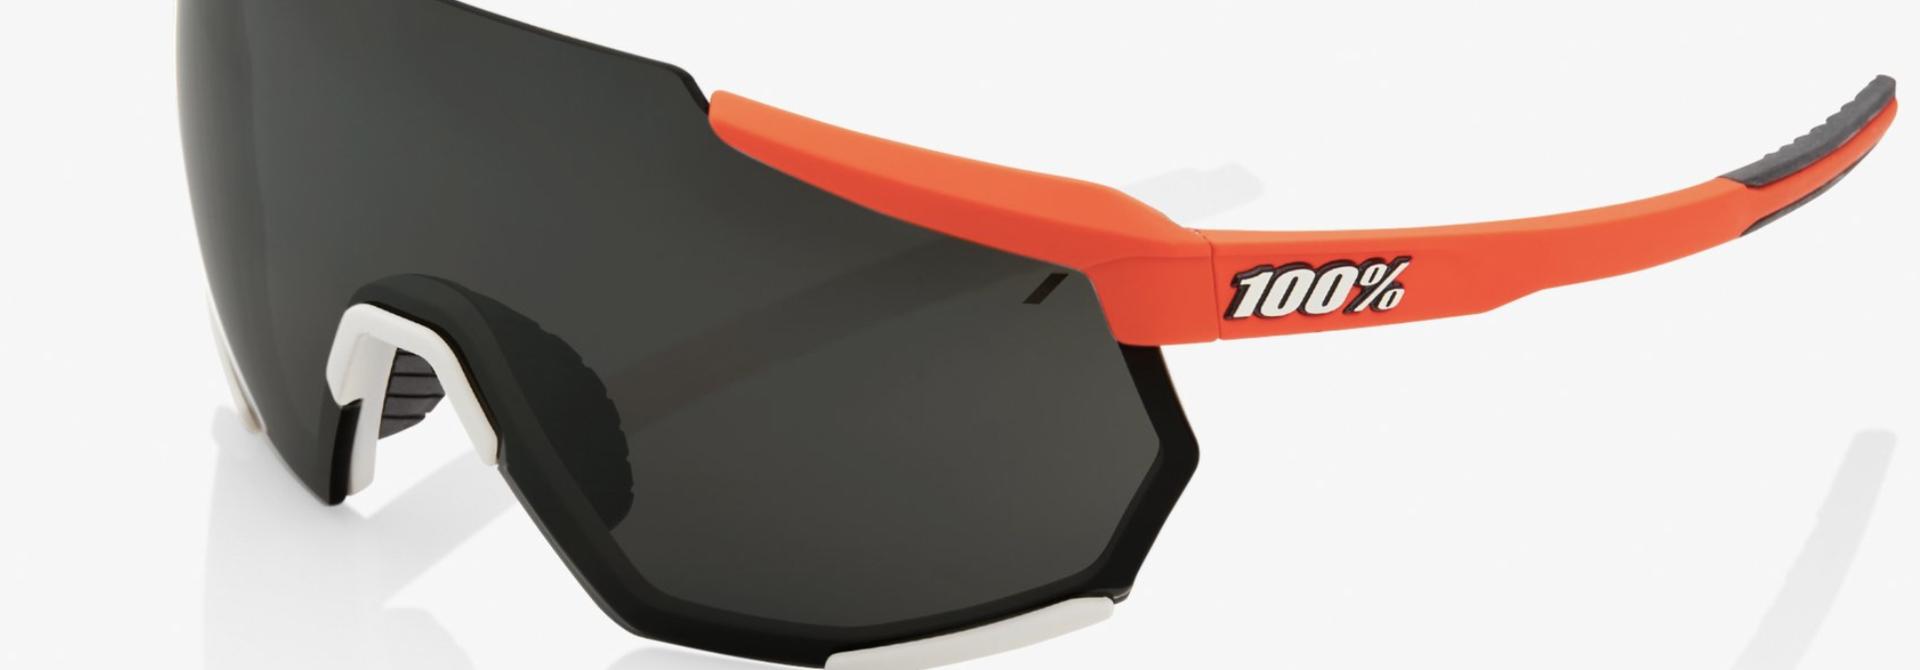 Racetrap Sunglasses, Soft Tact Oxyfire frame - Black Mirror Lens